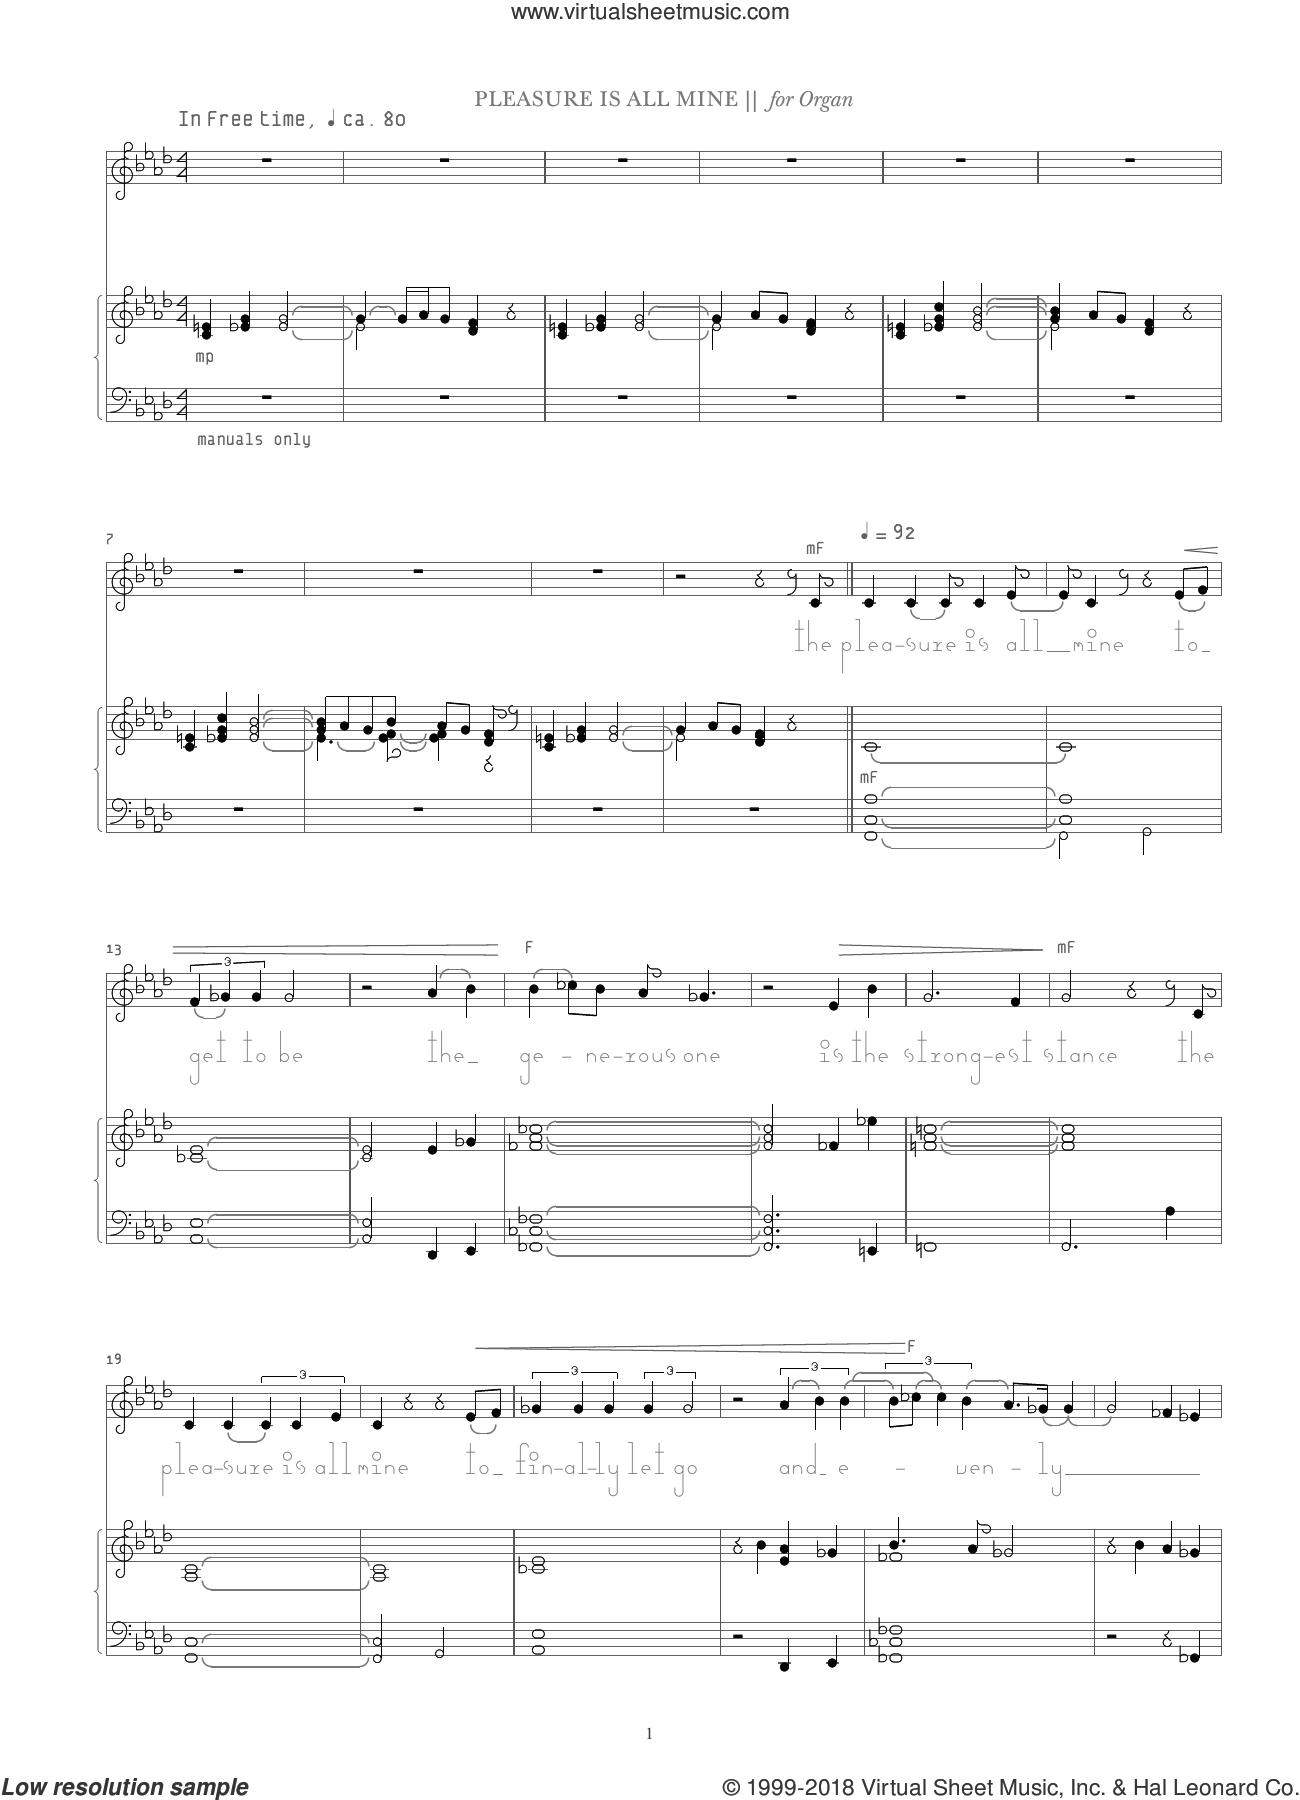 Pleasure Is All Mine sheet music for organ by Bjork Gudmundsdottir, intermediate skill level